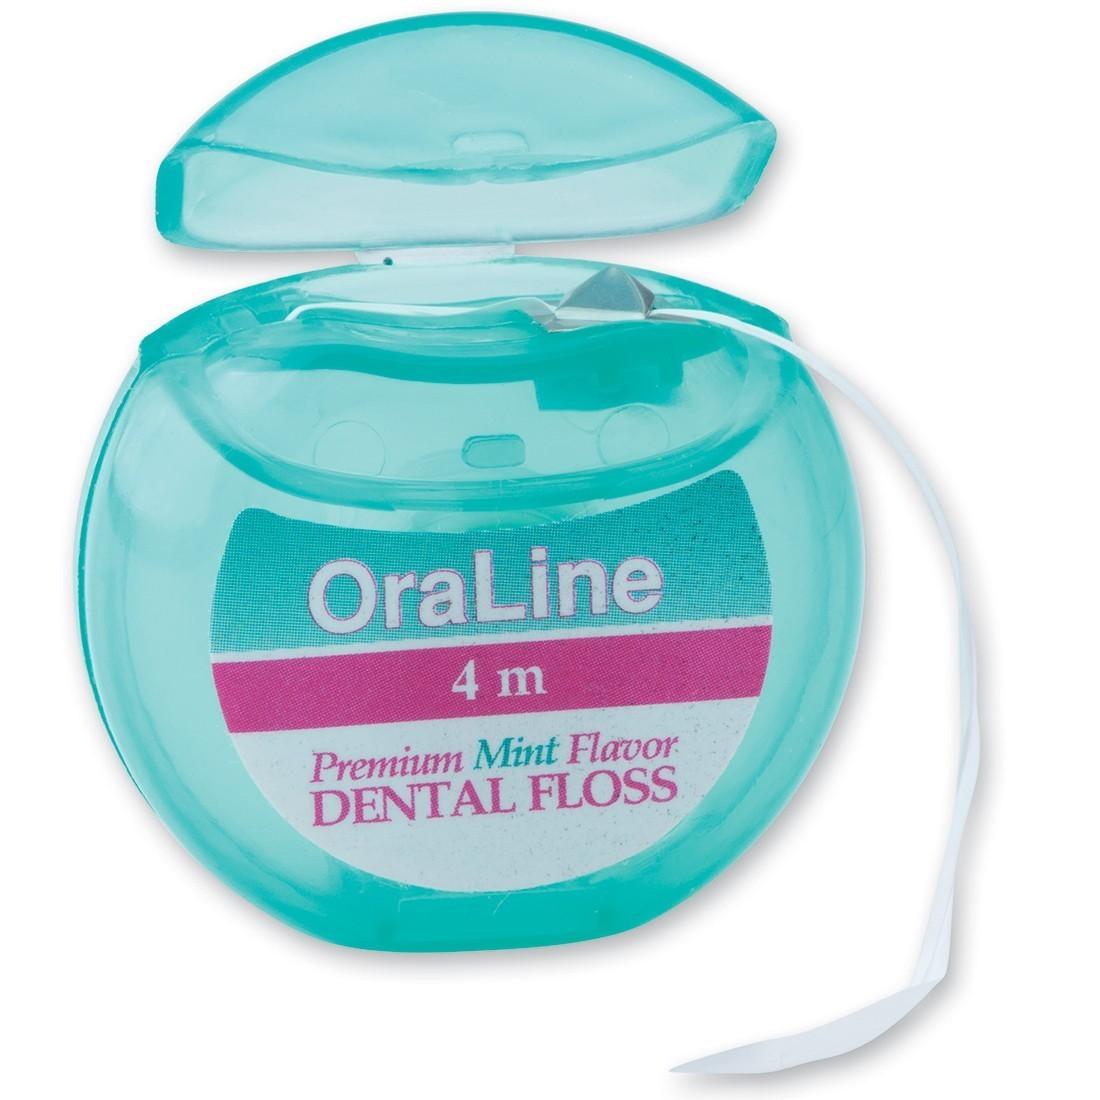 OraLine Premium Mint Floss - 4 Meters [image]